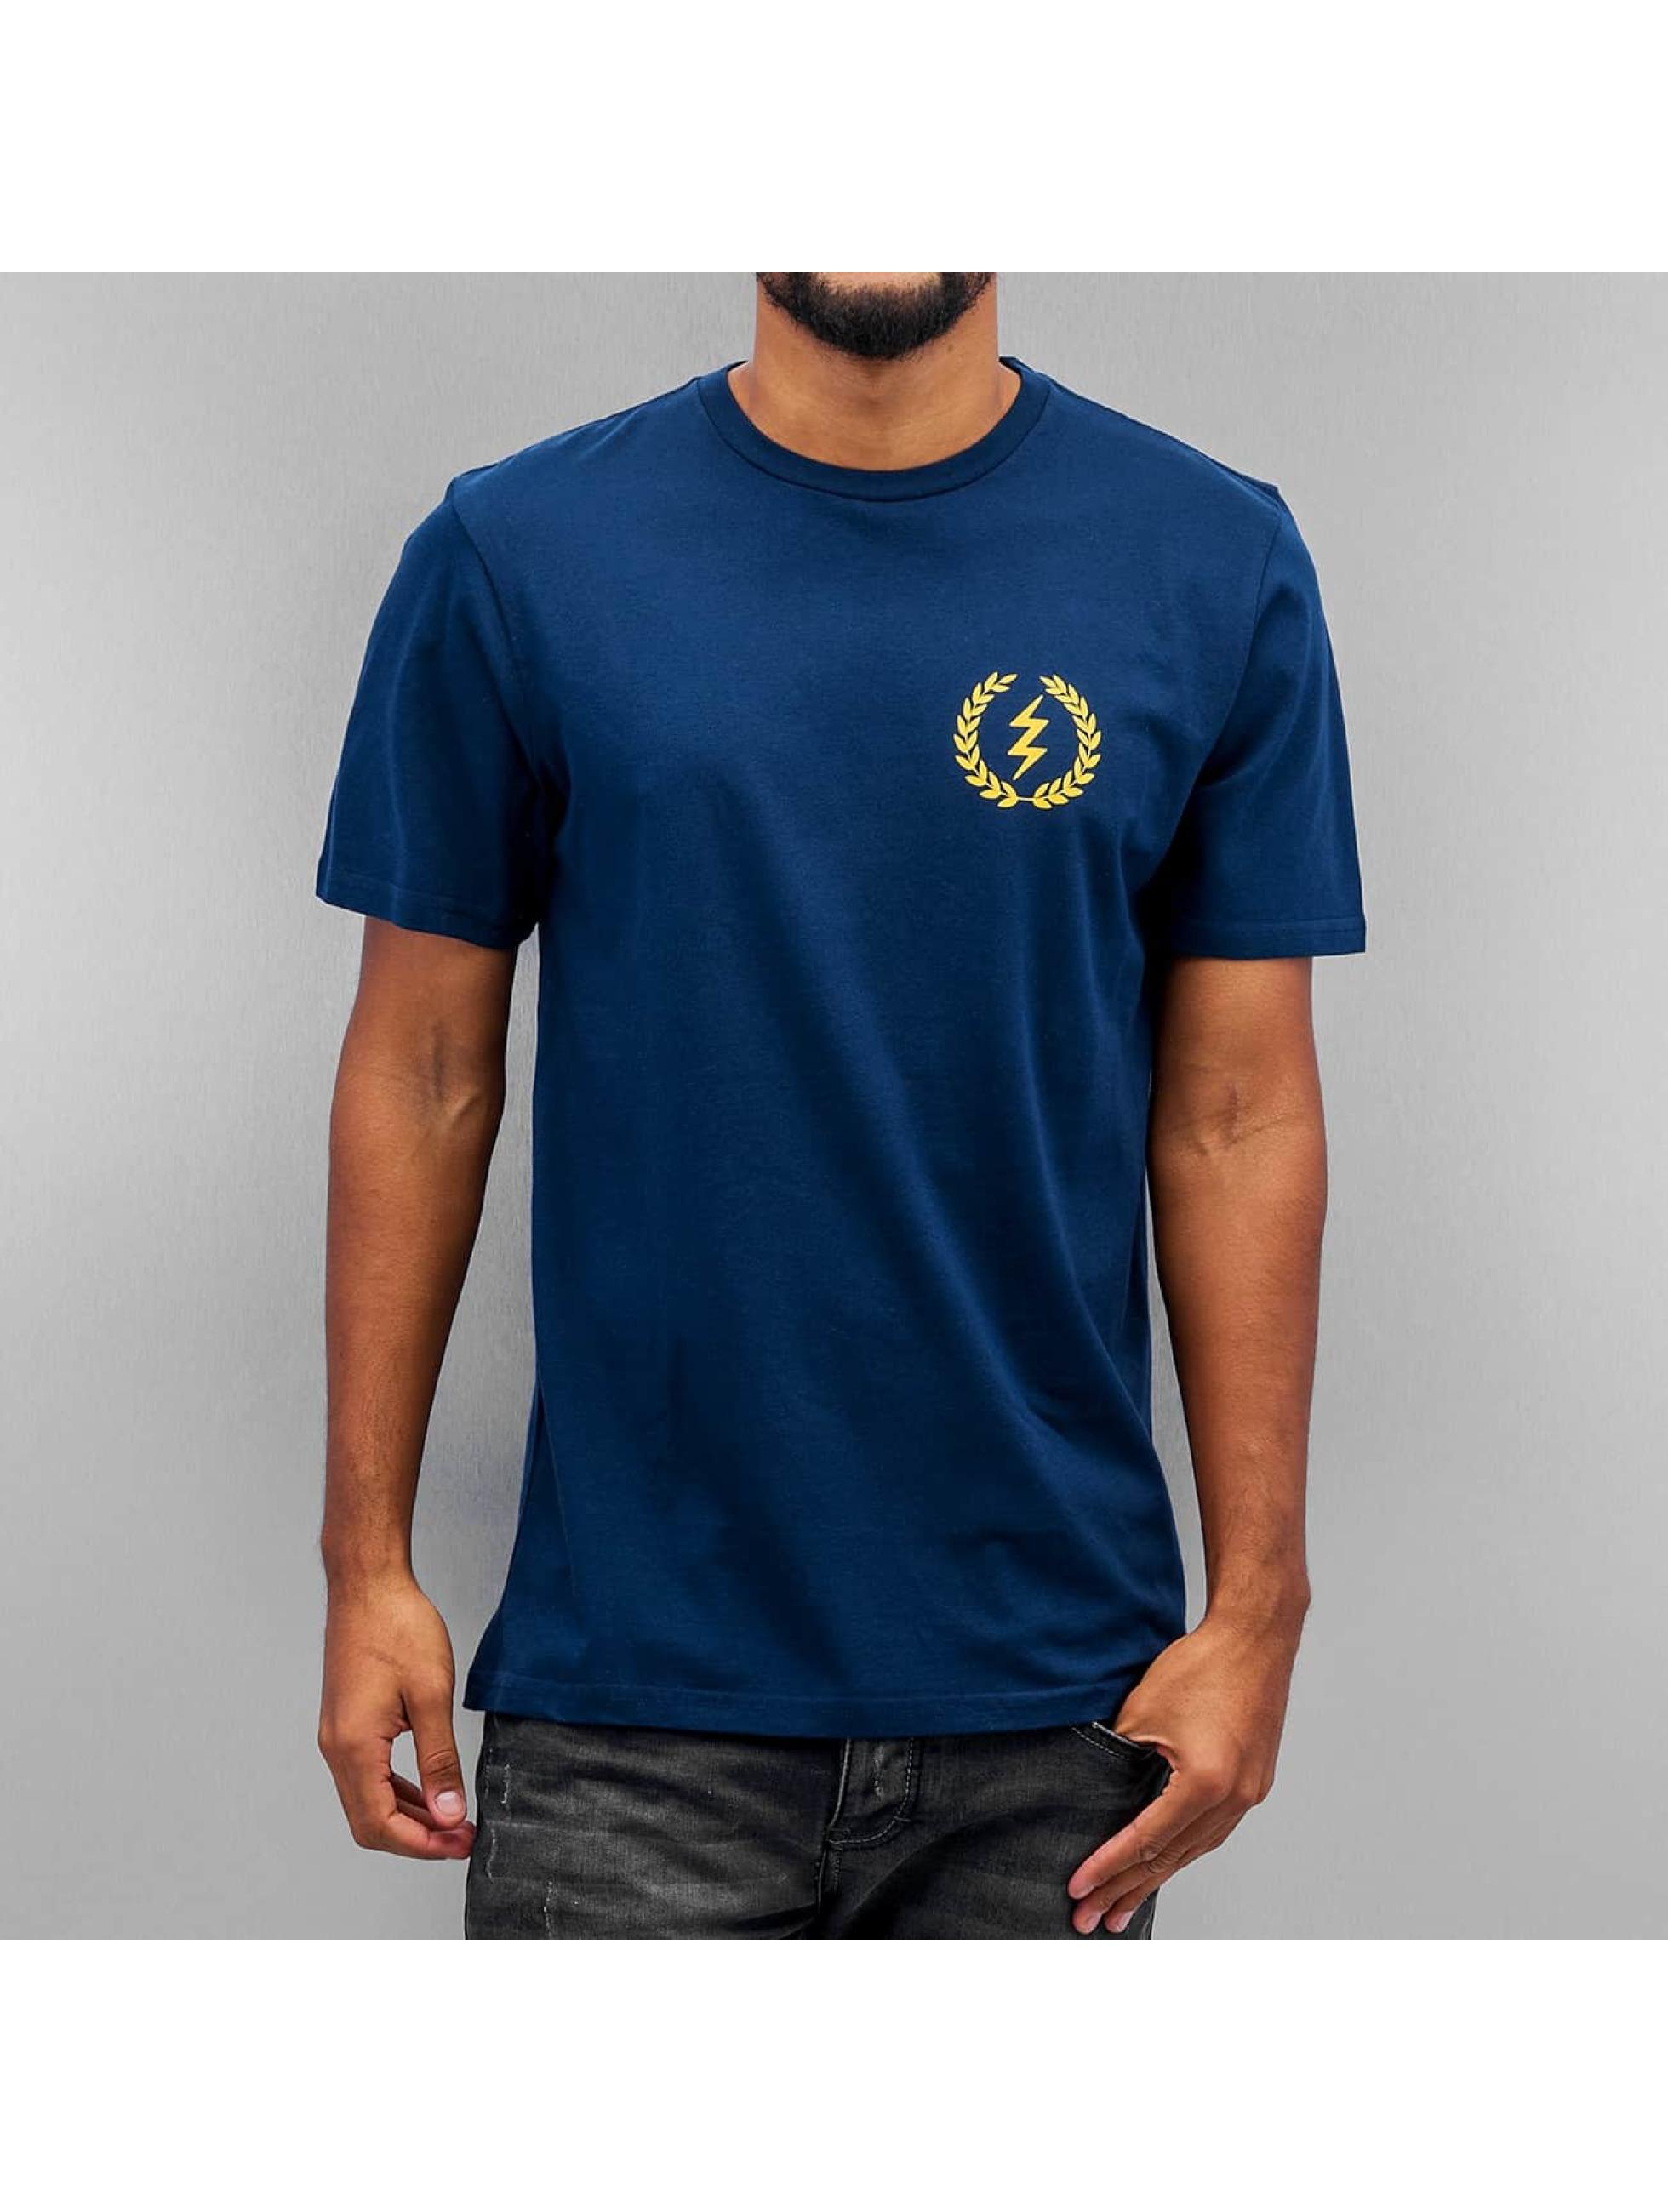 Electric t-shirt VOLT AWARD blauw